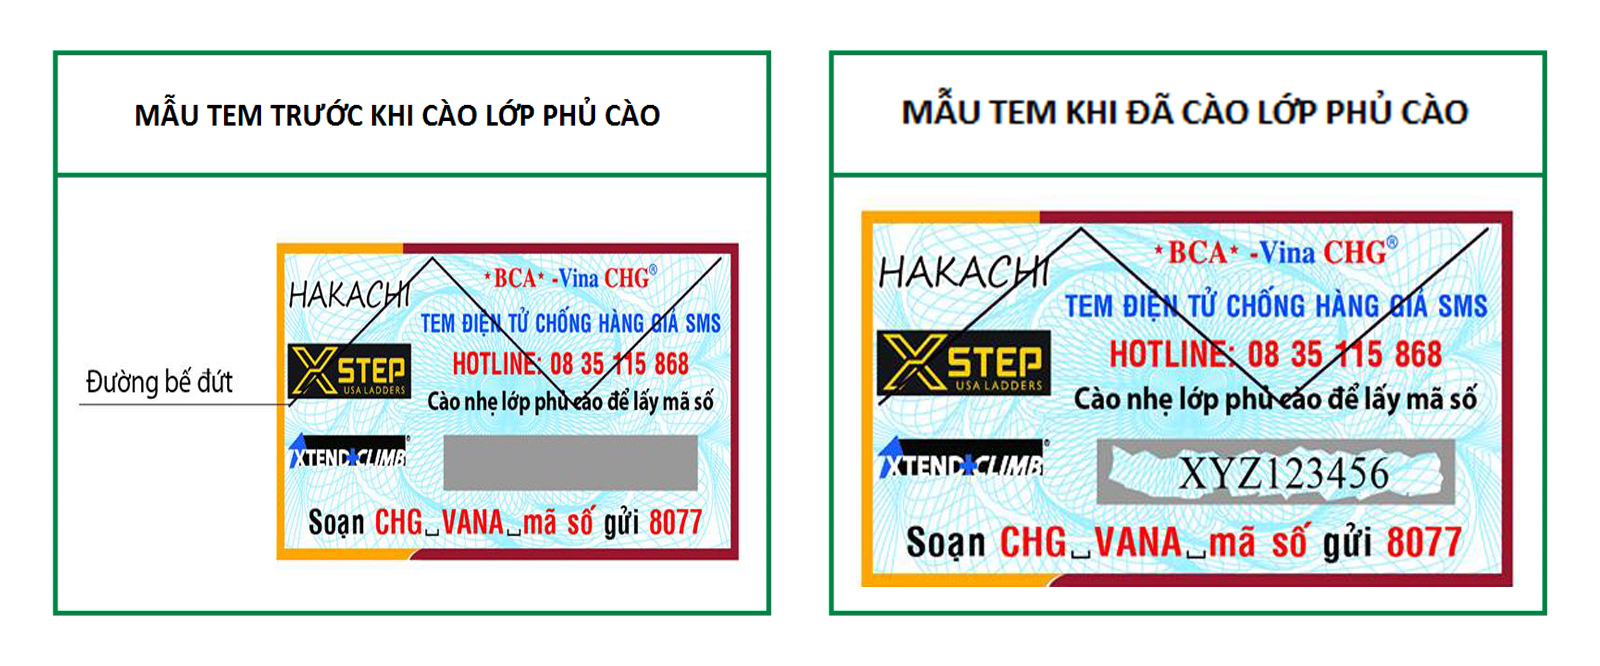 Huong dan xac nhan hang chinh hang van nam